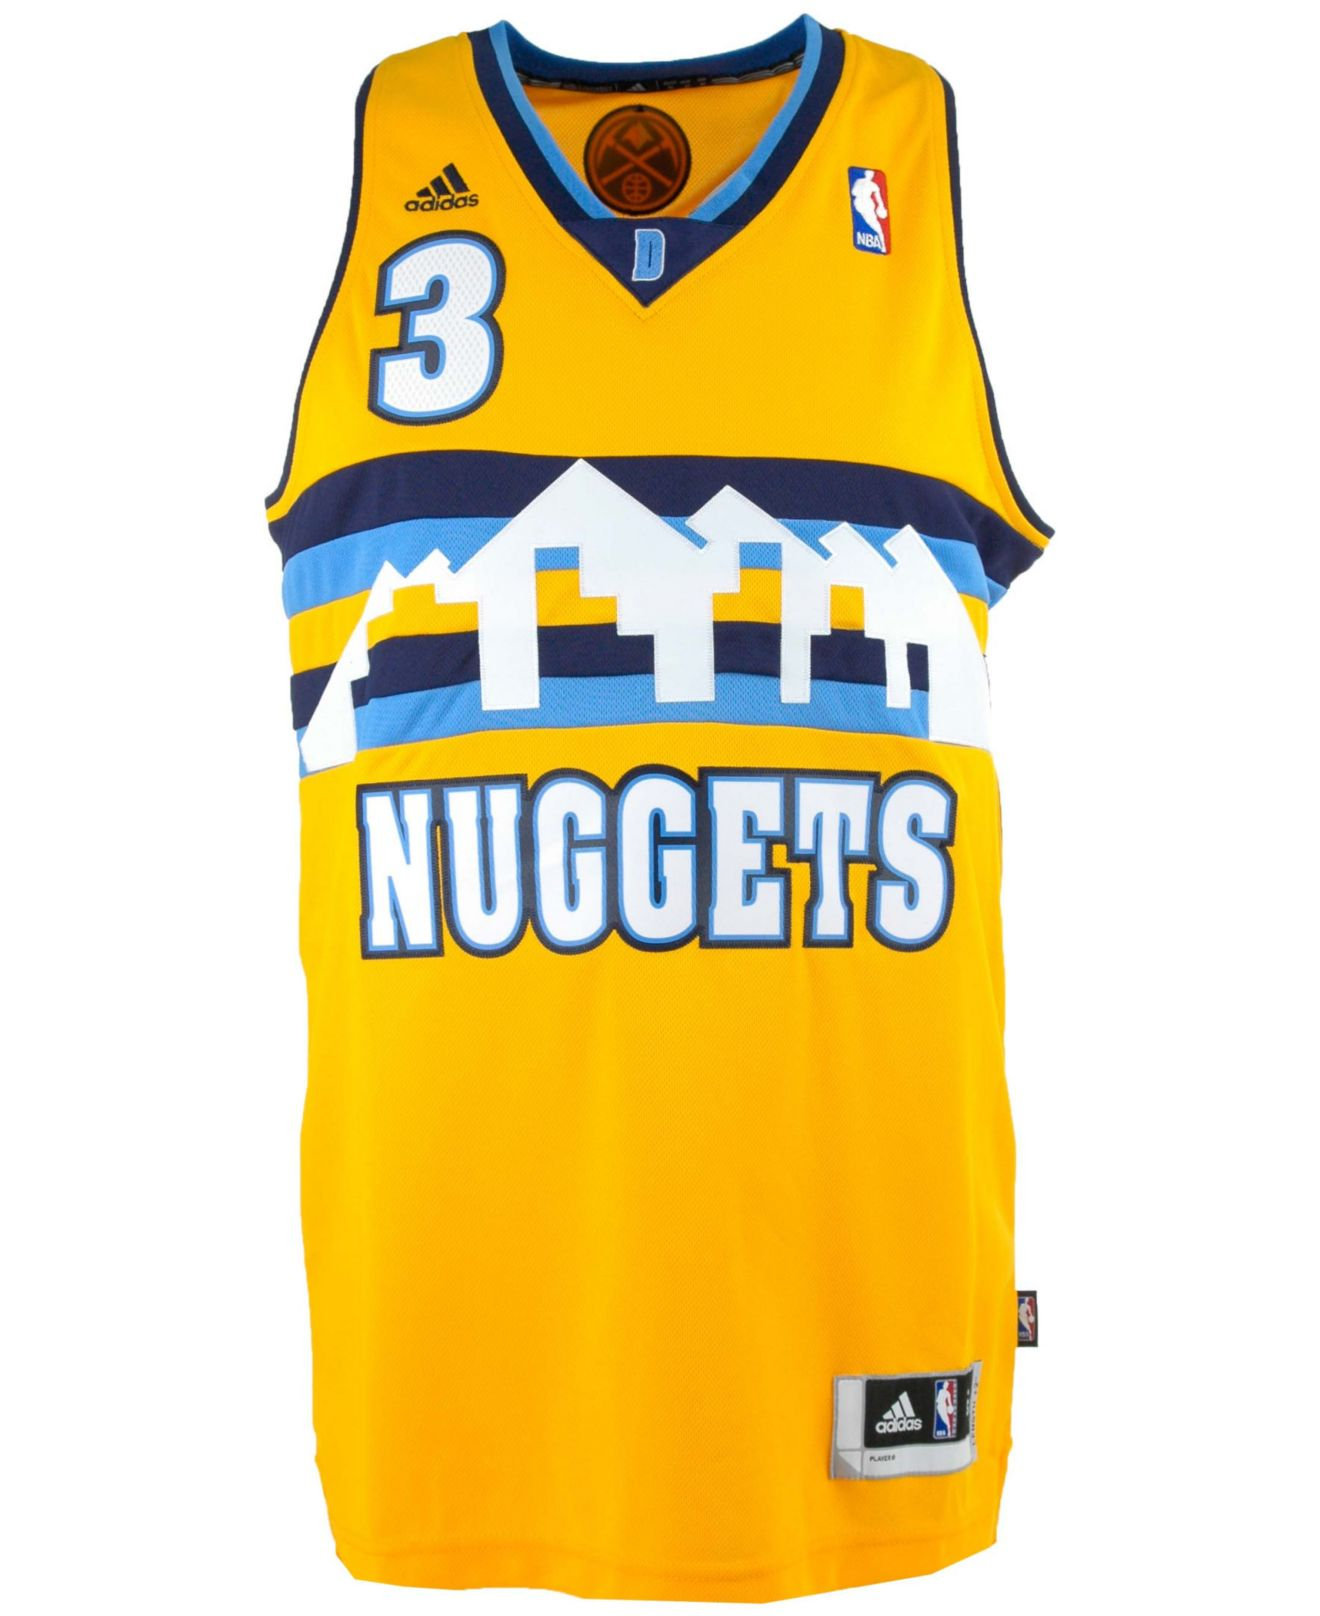 Adidas Denver Nuggets 3 Stripe Jacket: Adidas Men's Ty Lawson Denver Nuggets Swingman